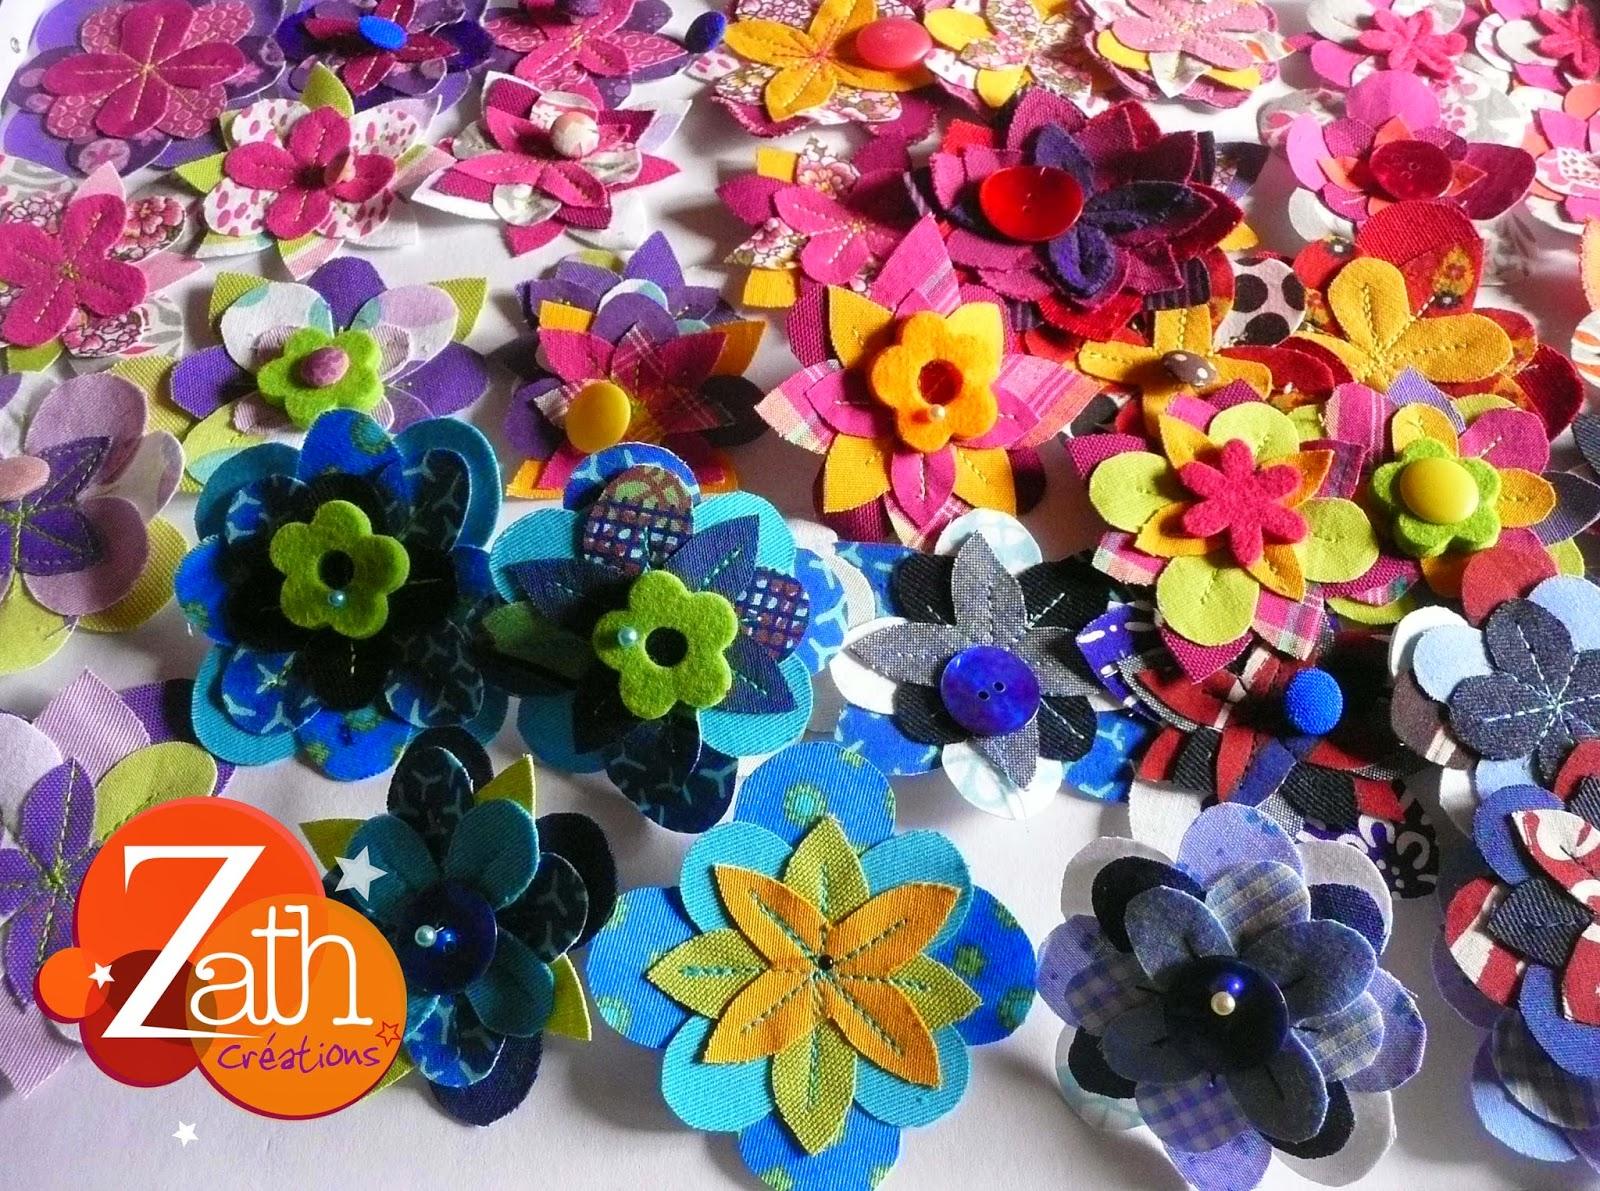 Fleurs Zath créations 2015